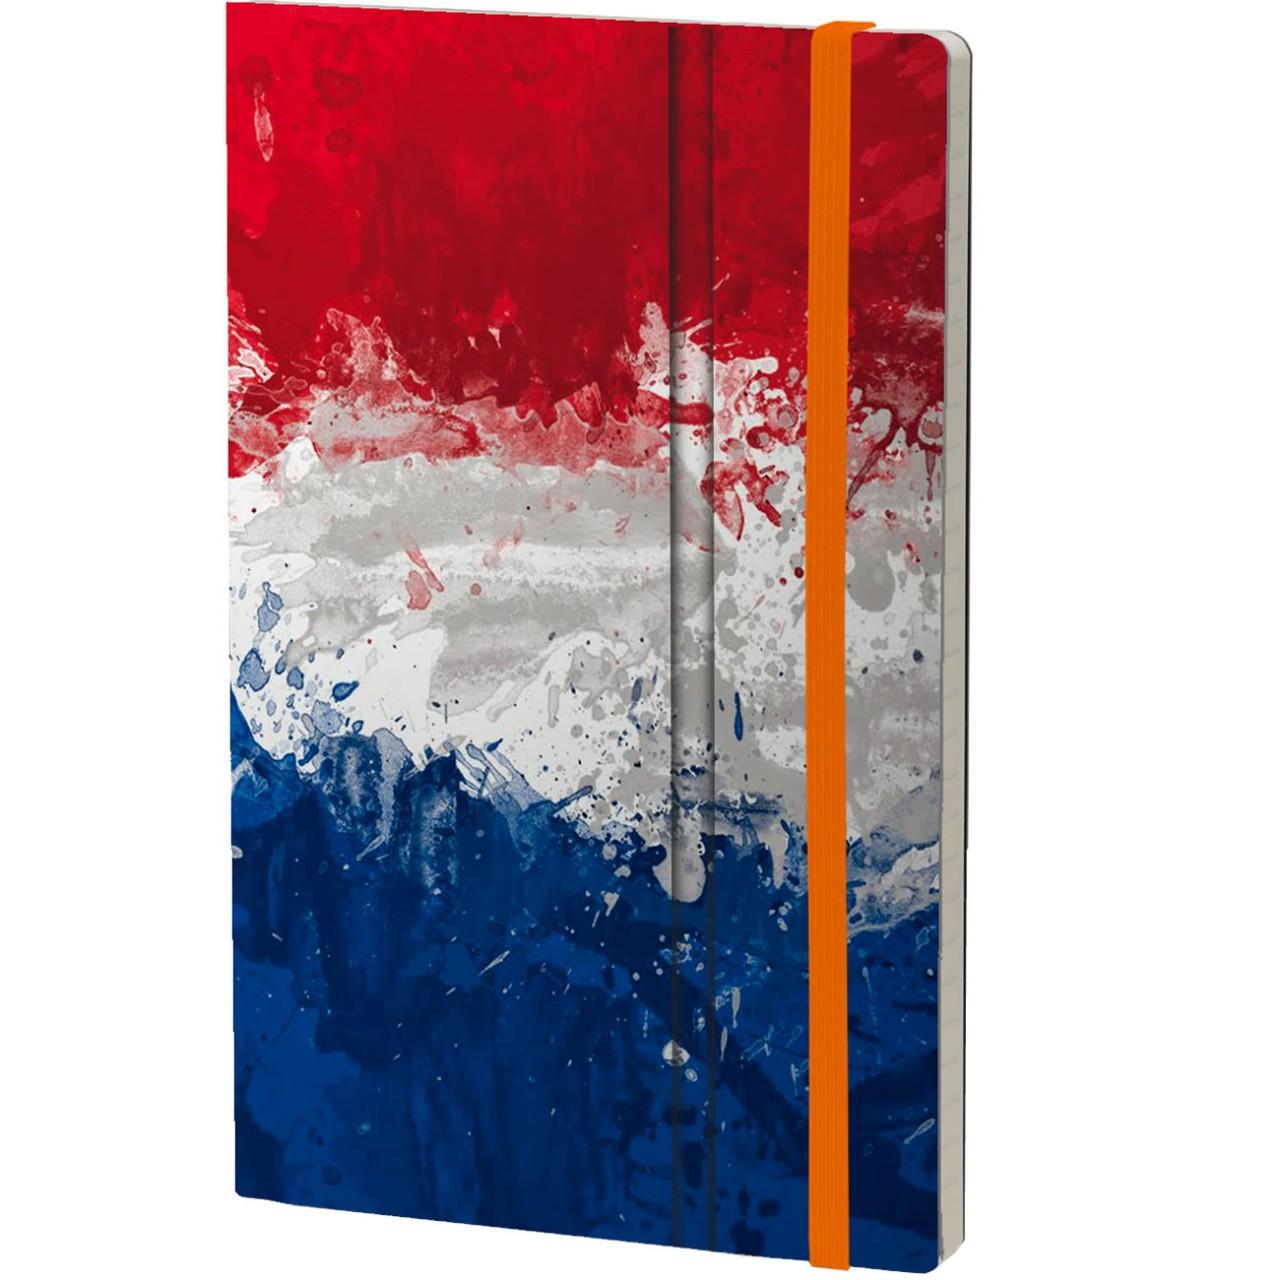 Stifflexible Notizbuch HISTORICAL NOTES 13 x 21 cm 192 S., IK ZAL HANDHAVEN (Netherlands Flag)